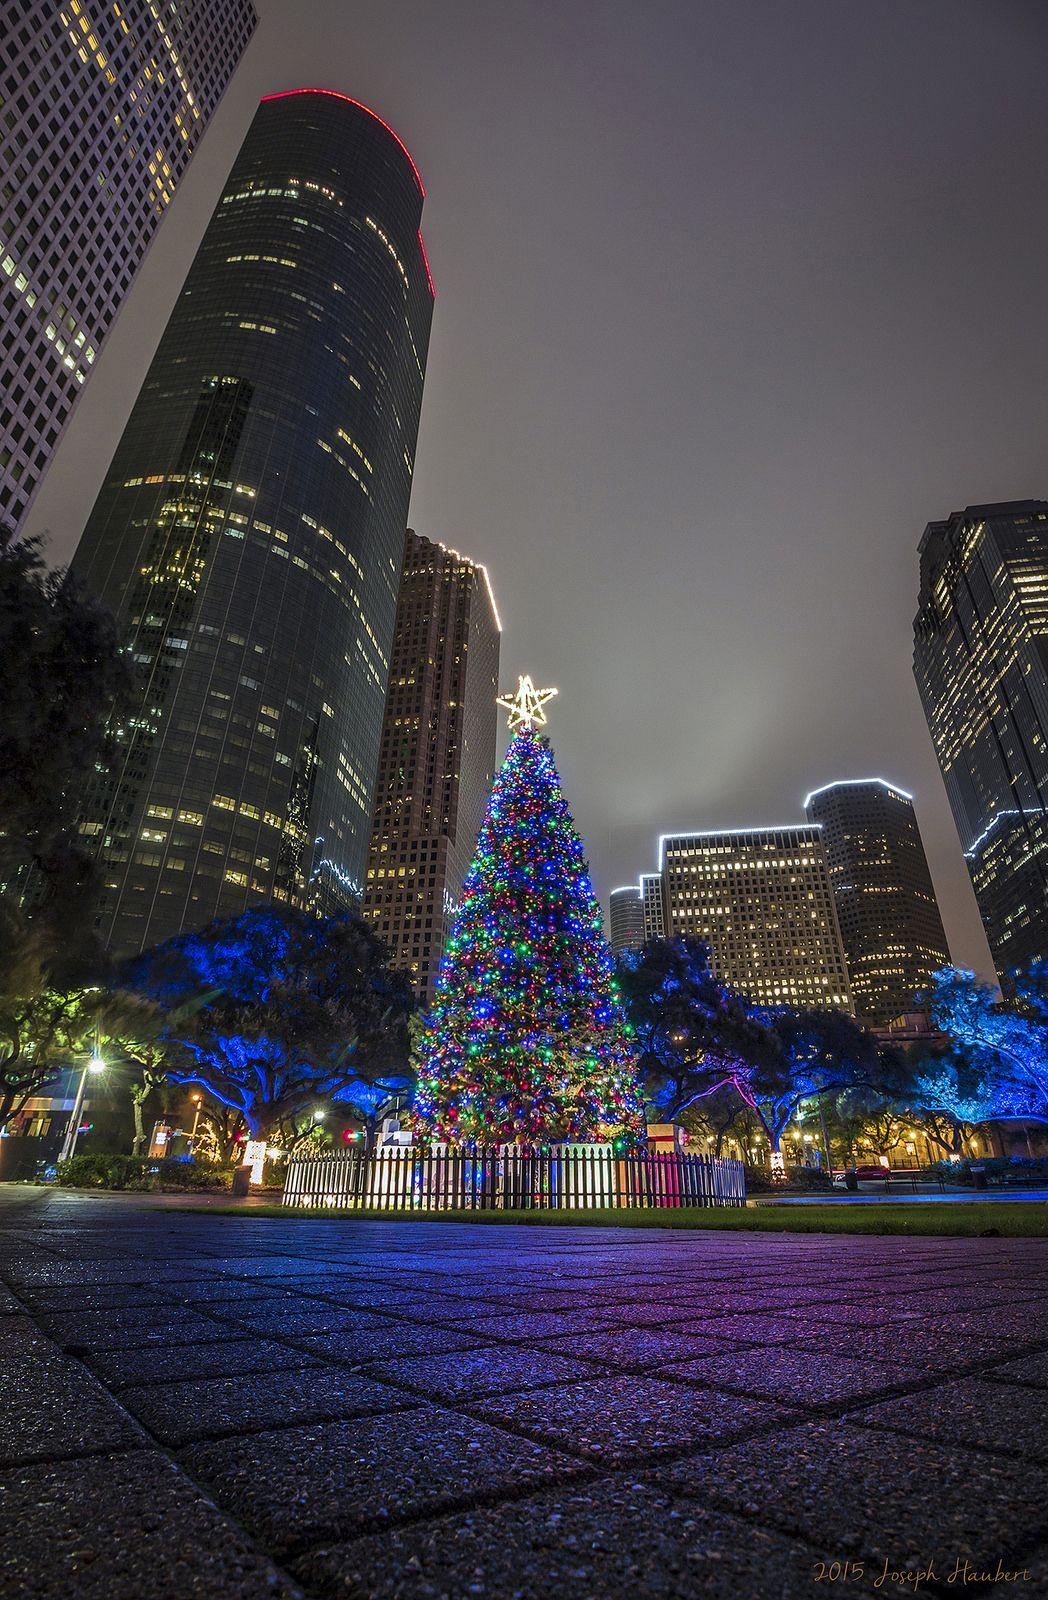 houston tx city hall christmas 2015 joseph haubert wwwjosephhaubertcom - Christmas In Houston 2015